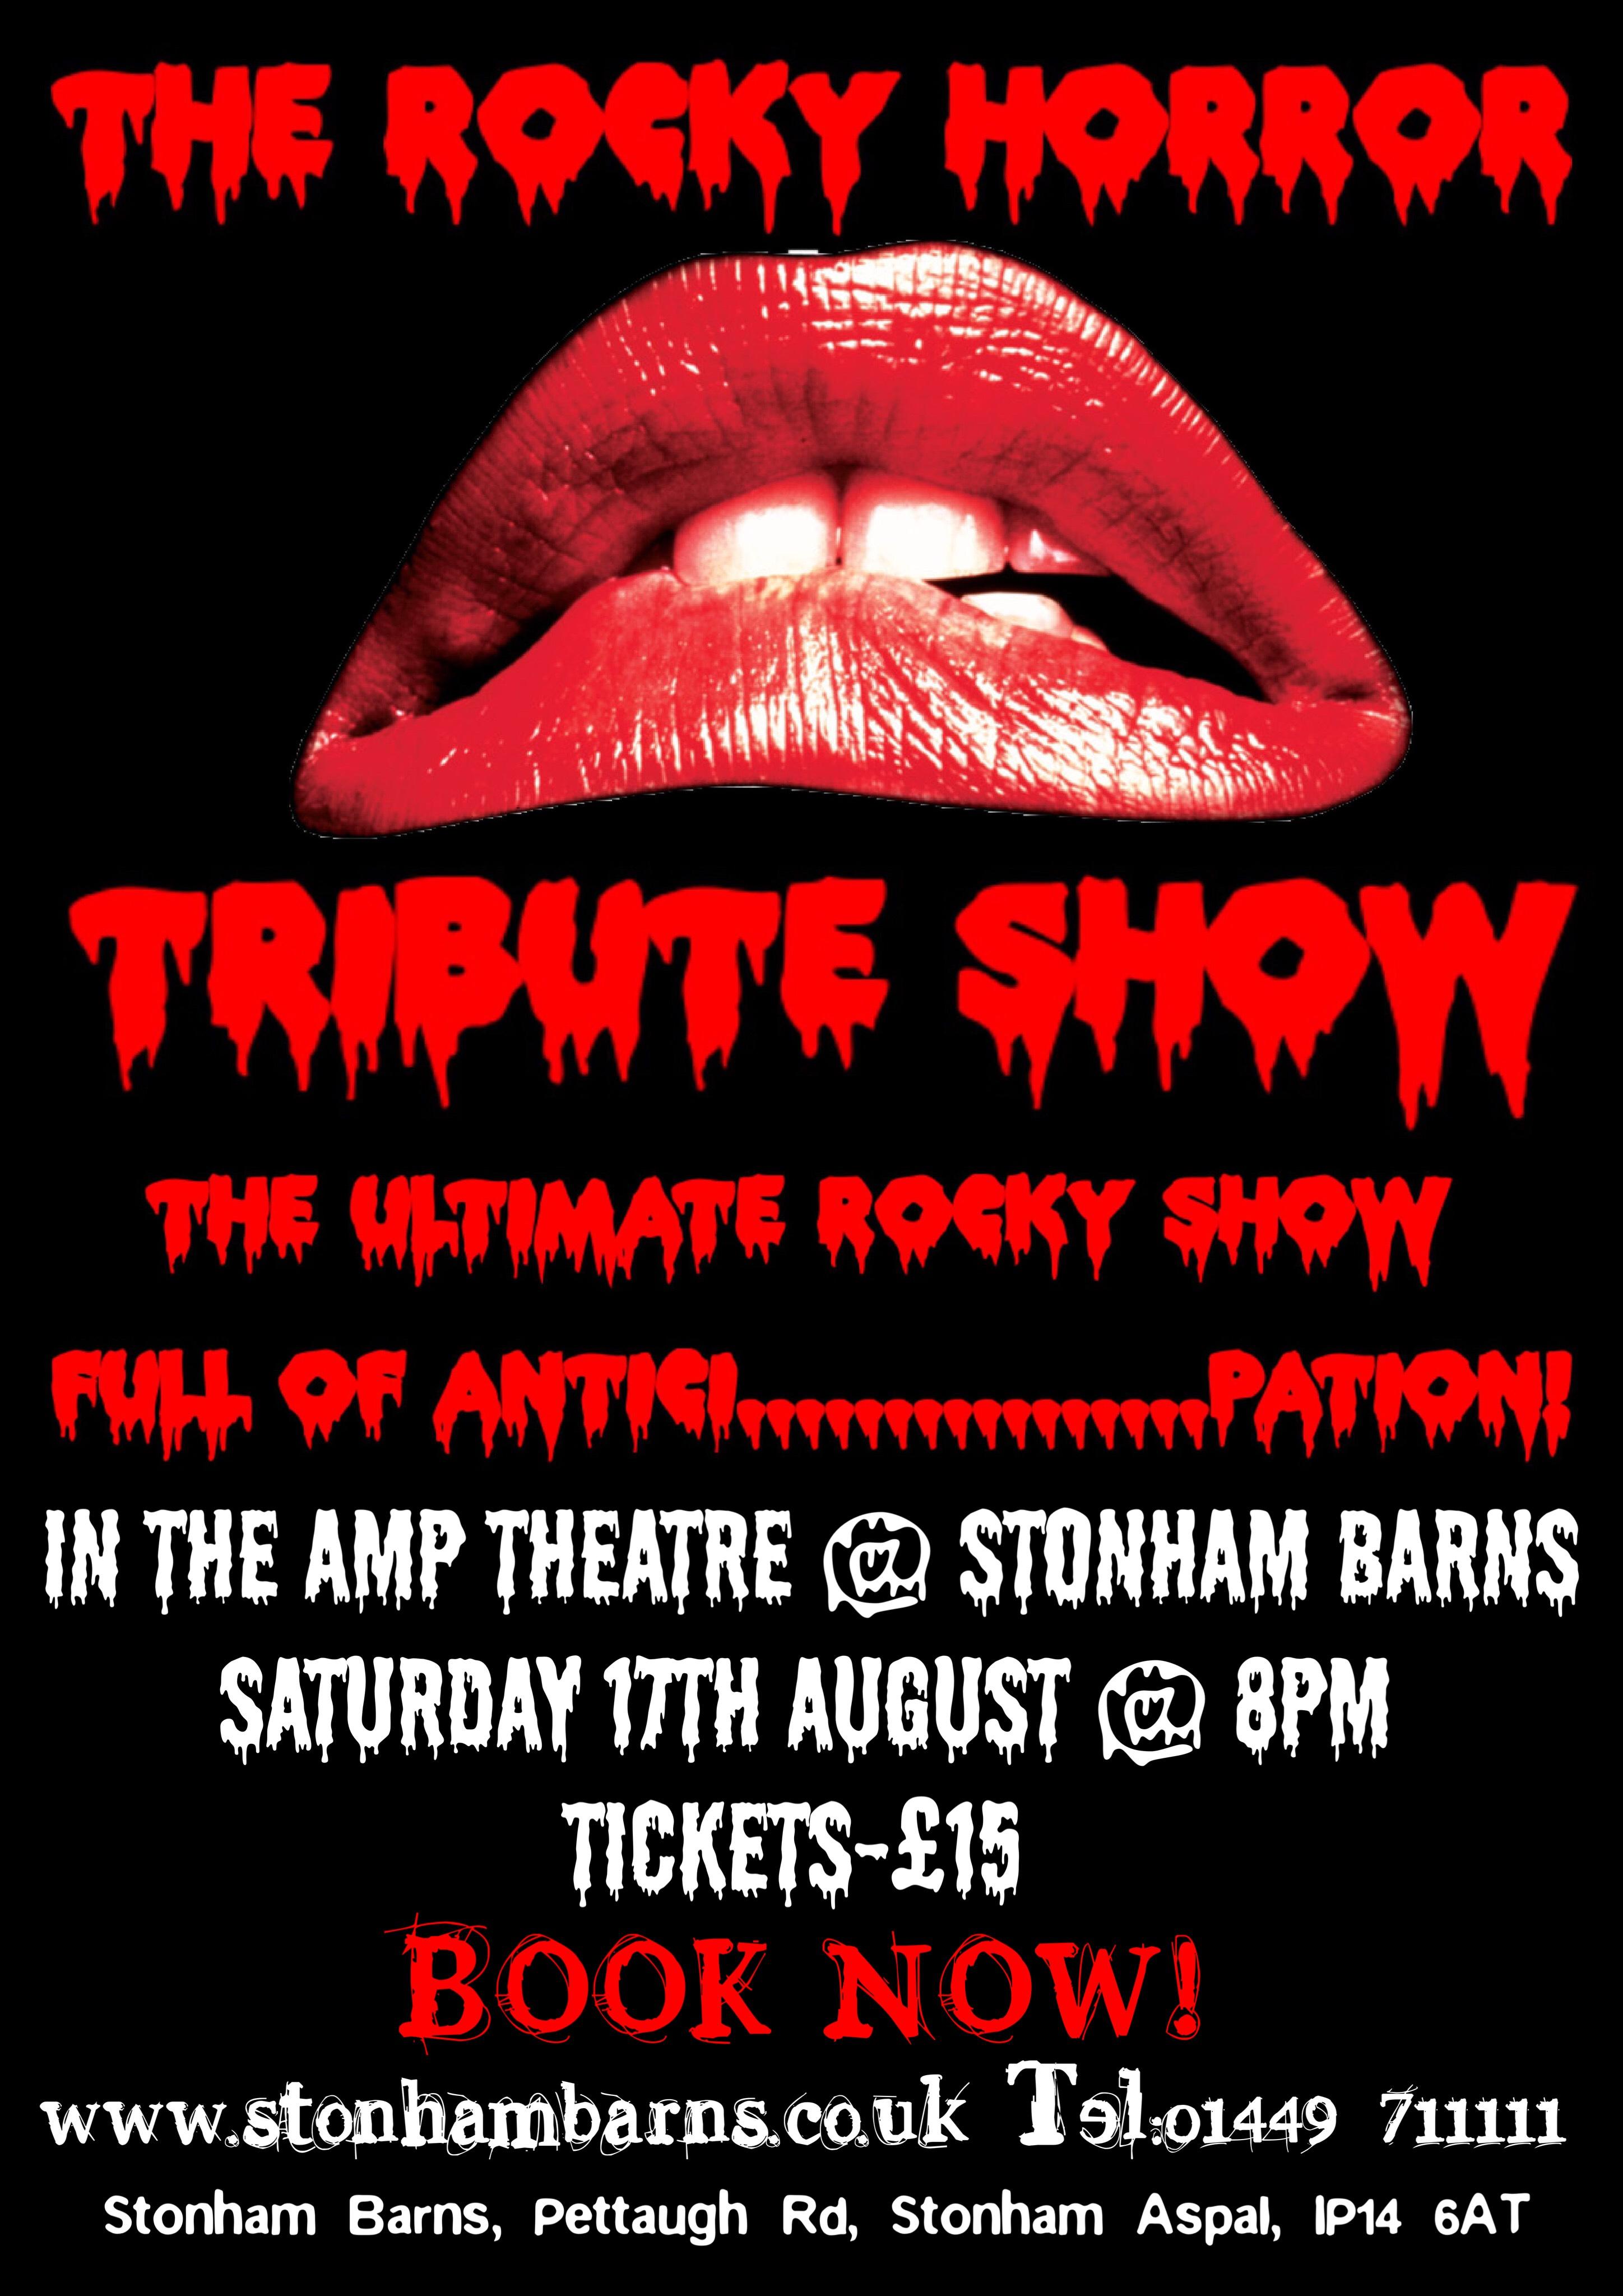 The Rocky Horror Tribute Show Stonham Barns